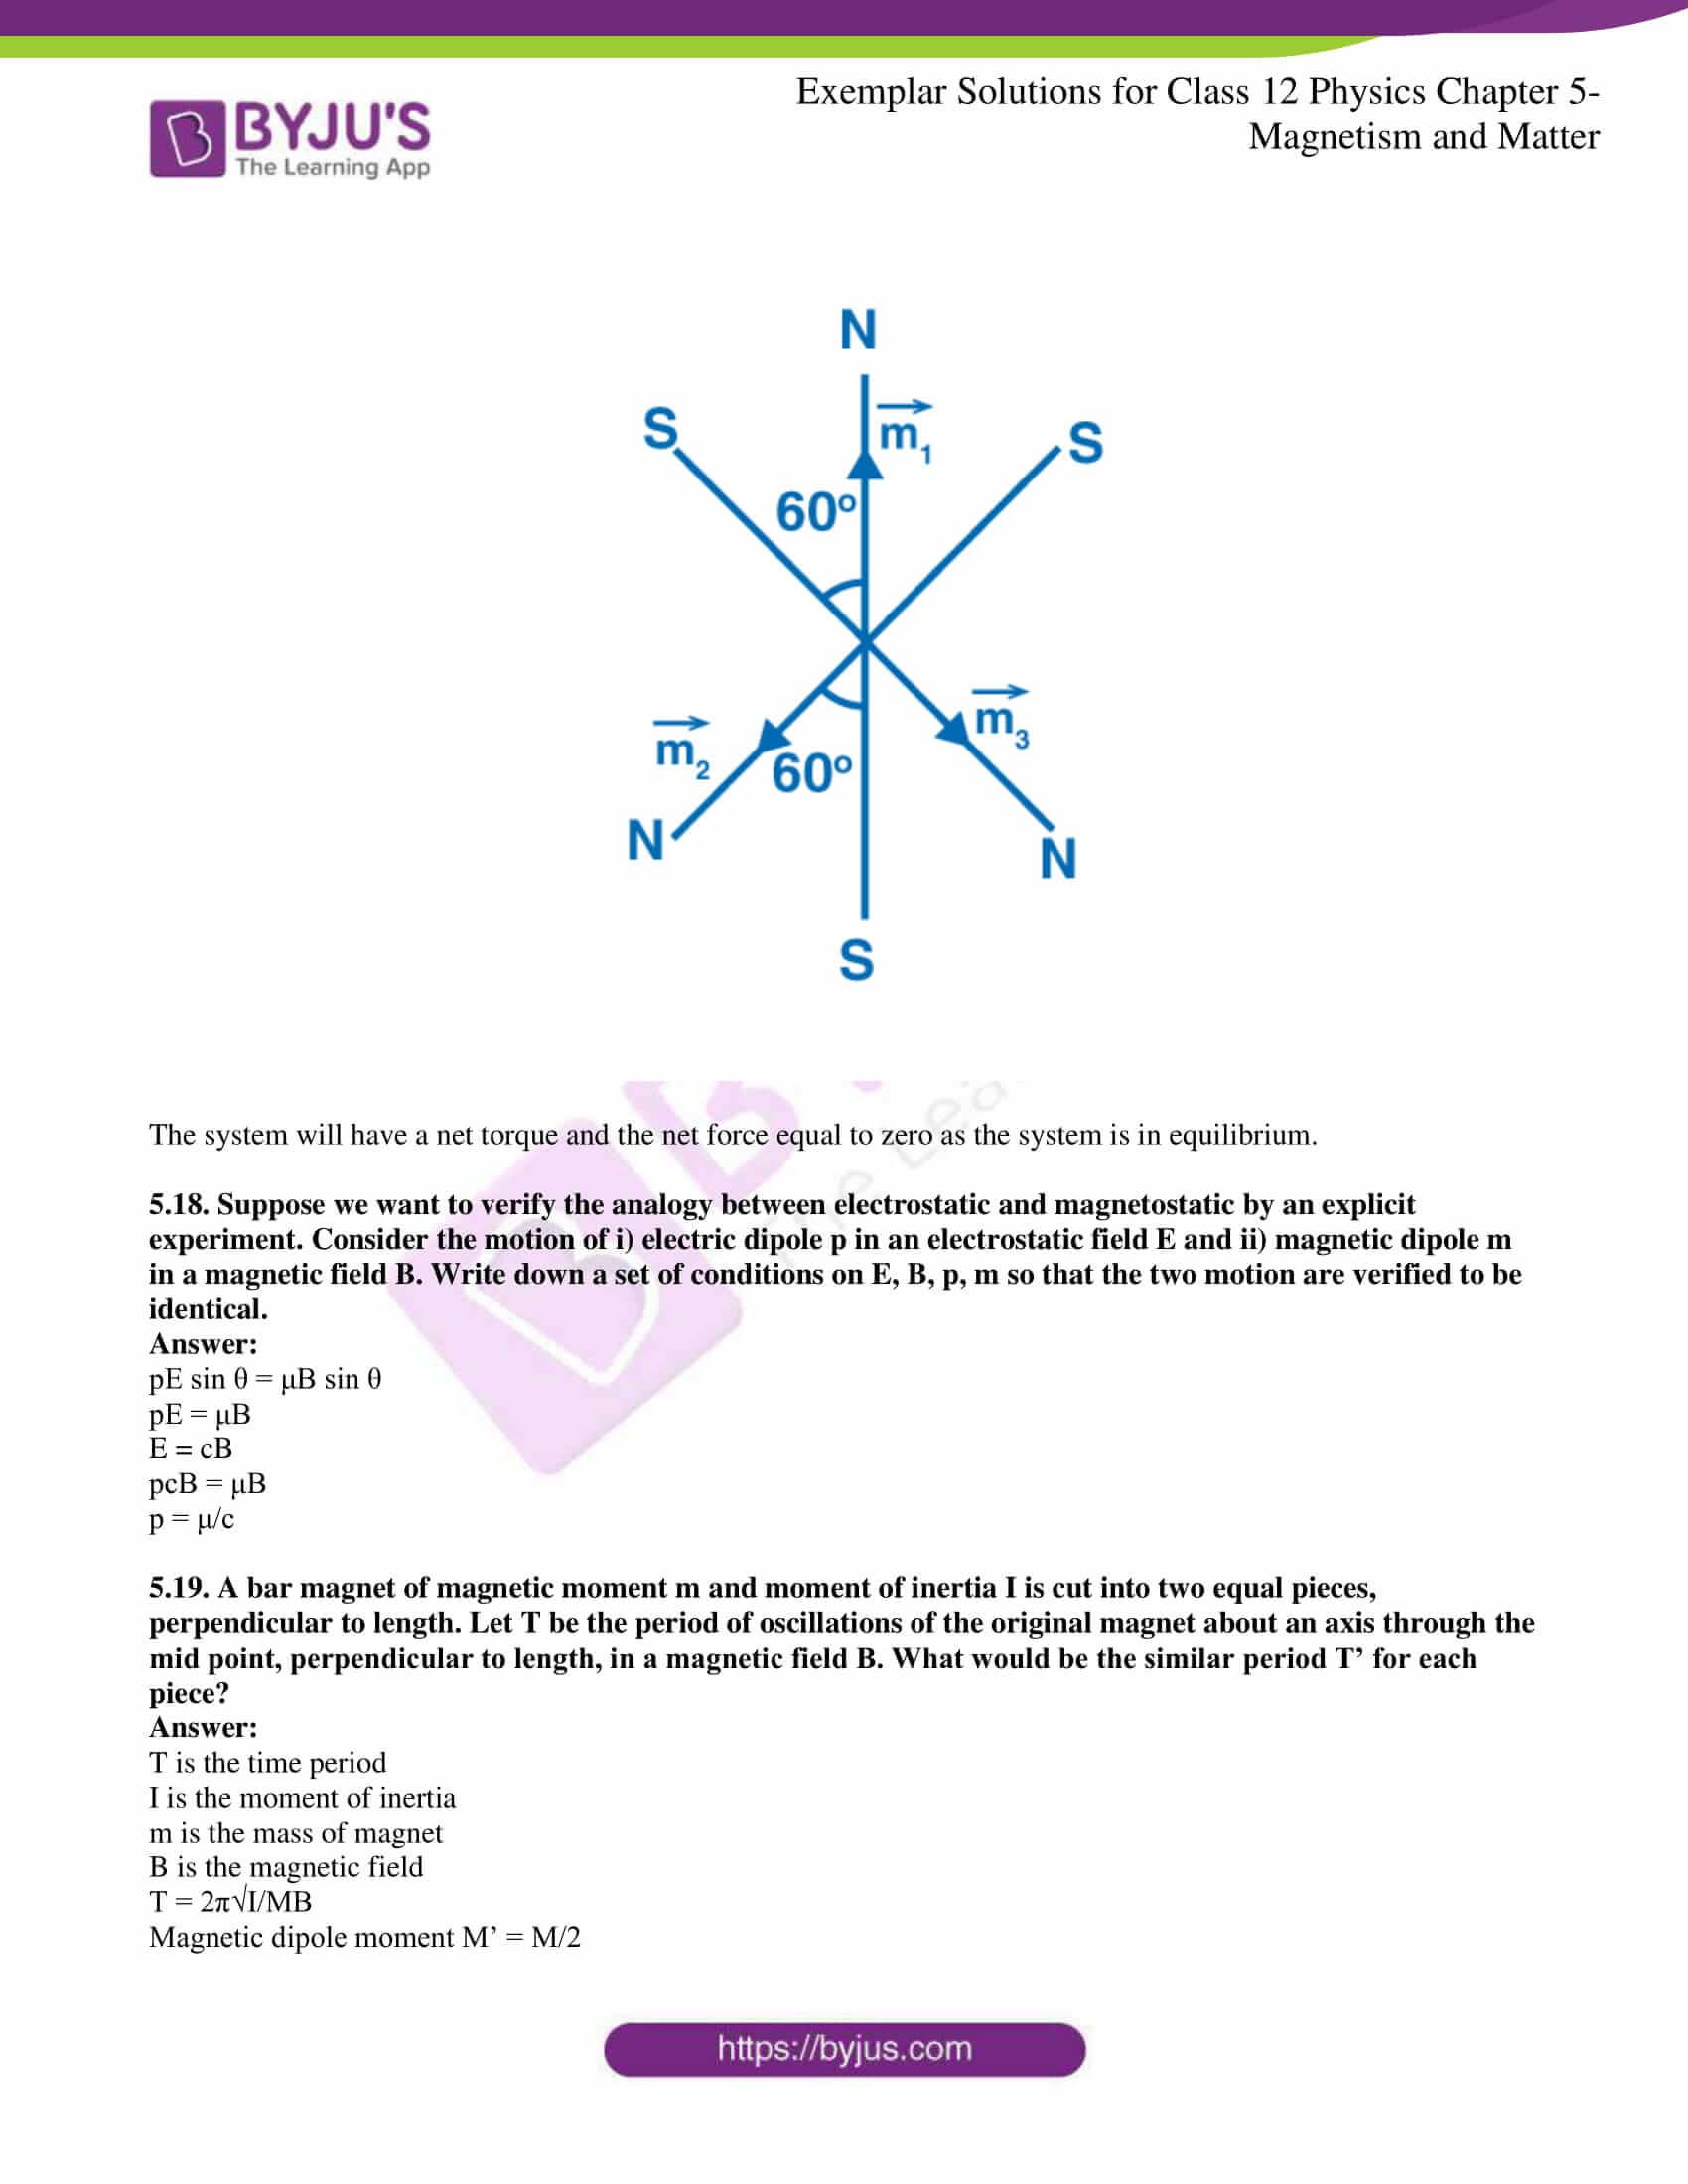 ncert exemplar solutions for class 12 physics chapter 5 06